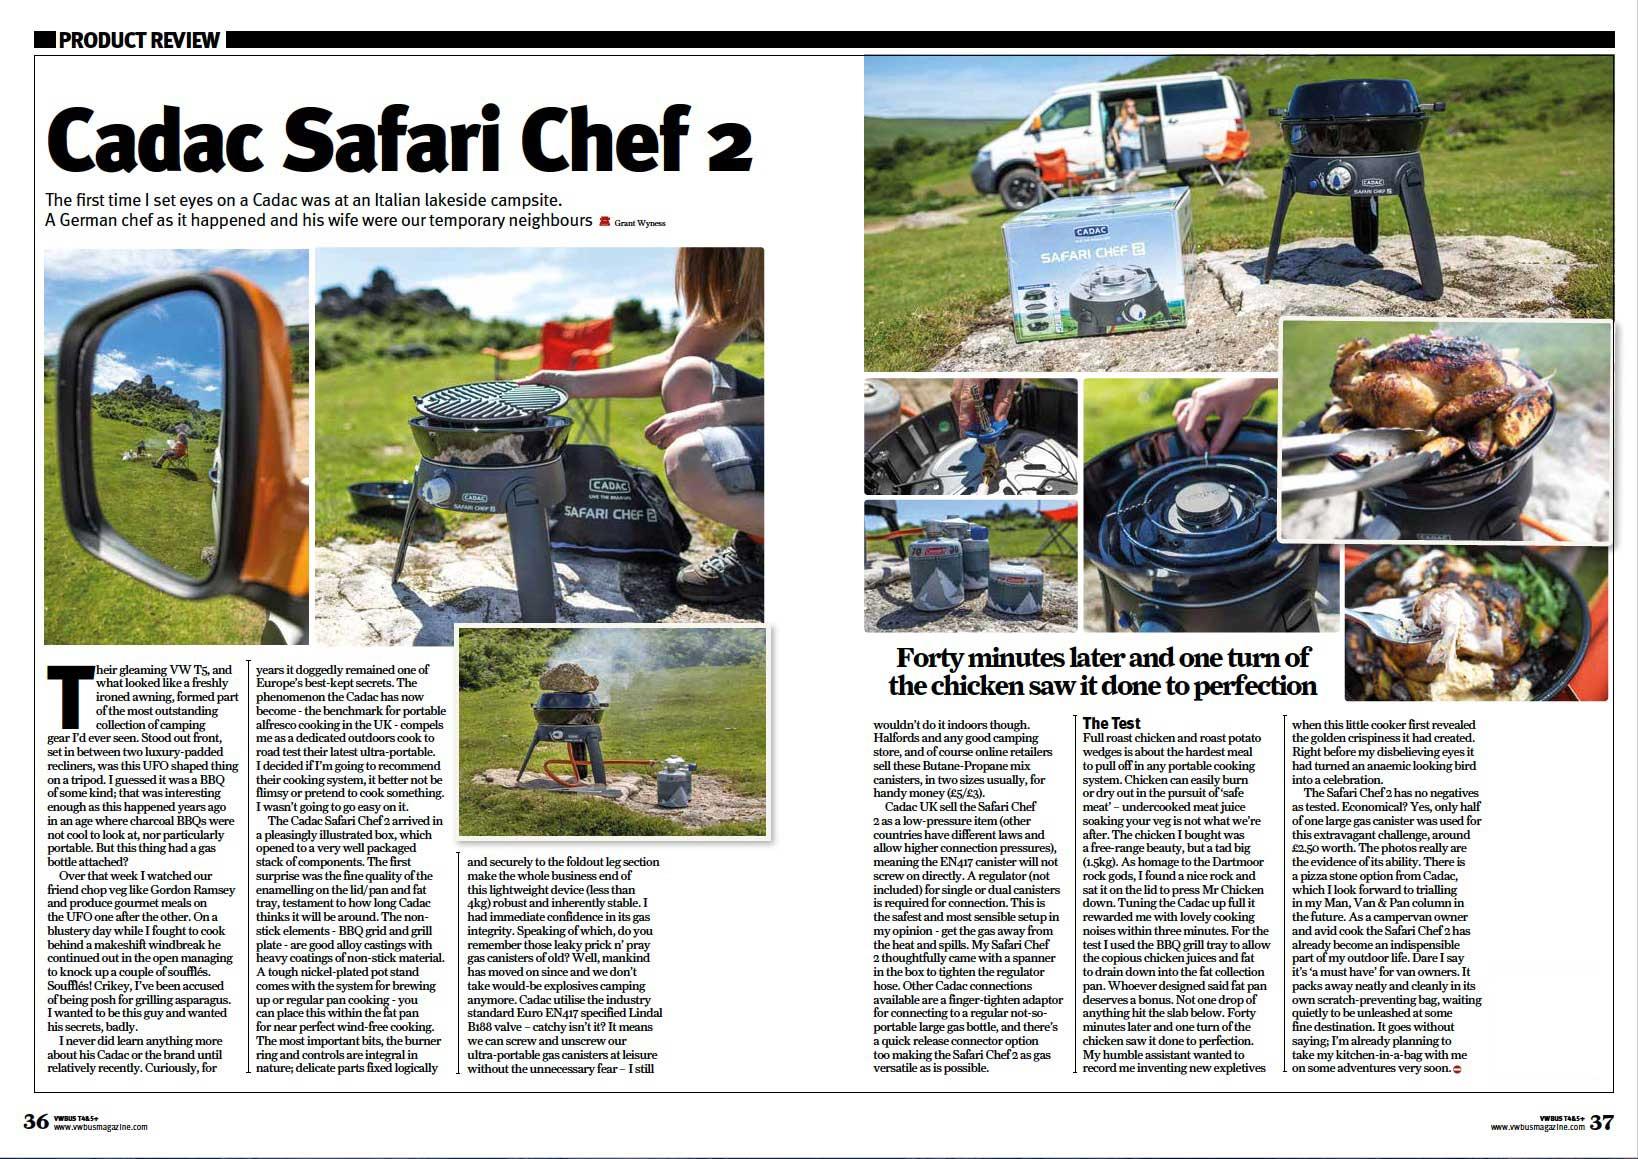 Cadac safari chef 2 reviewgrant wyness - Cadac safari chef ...